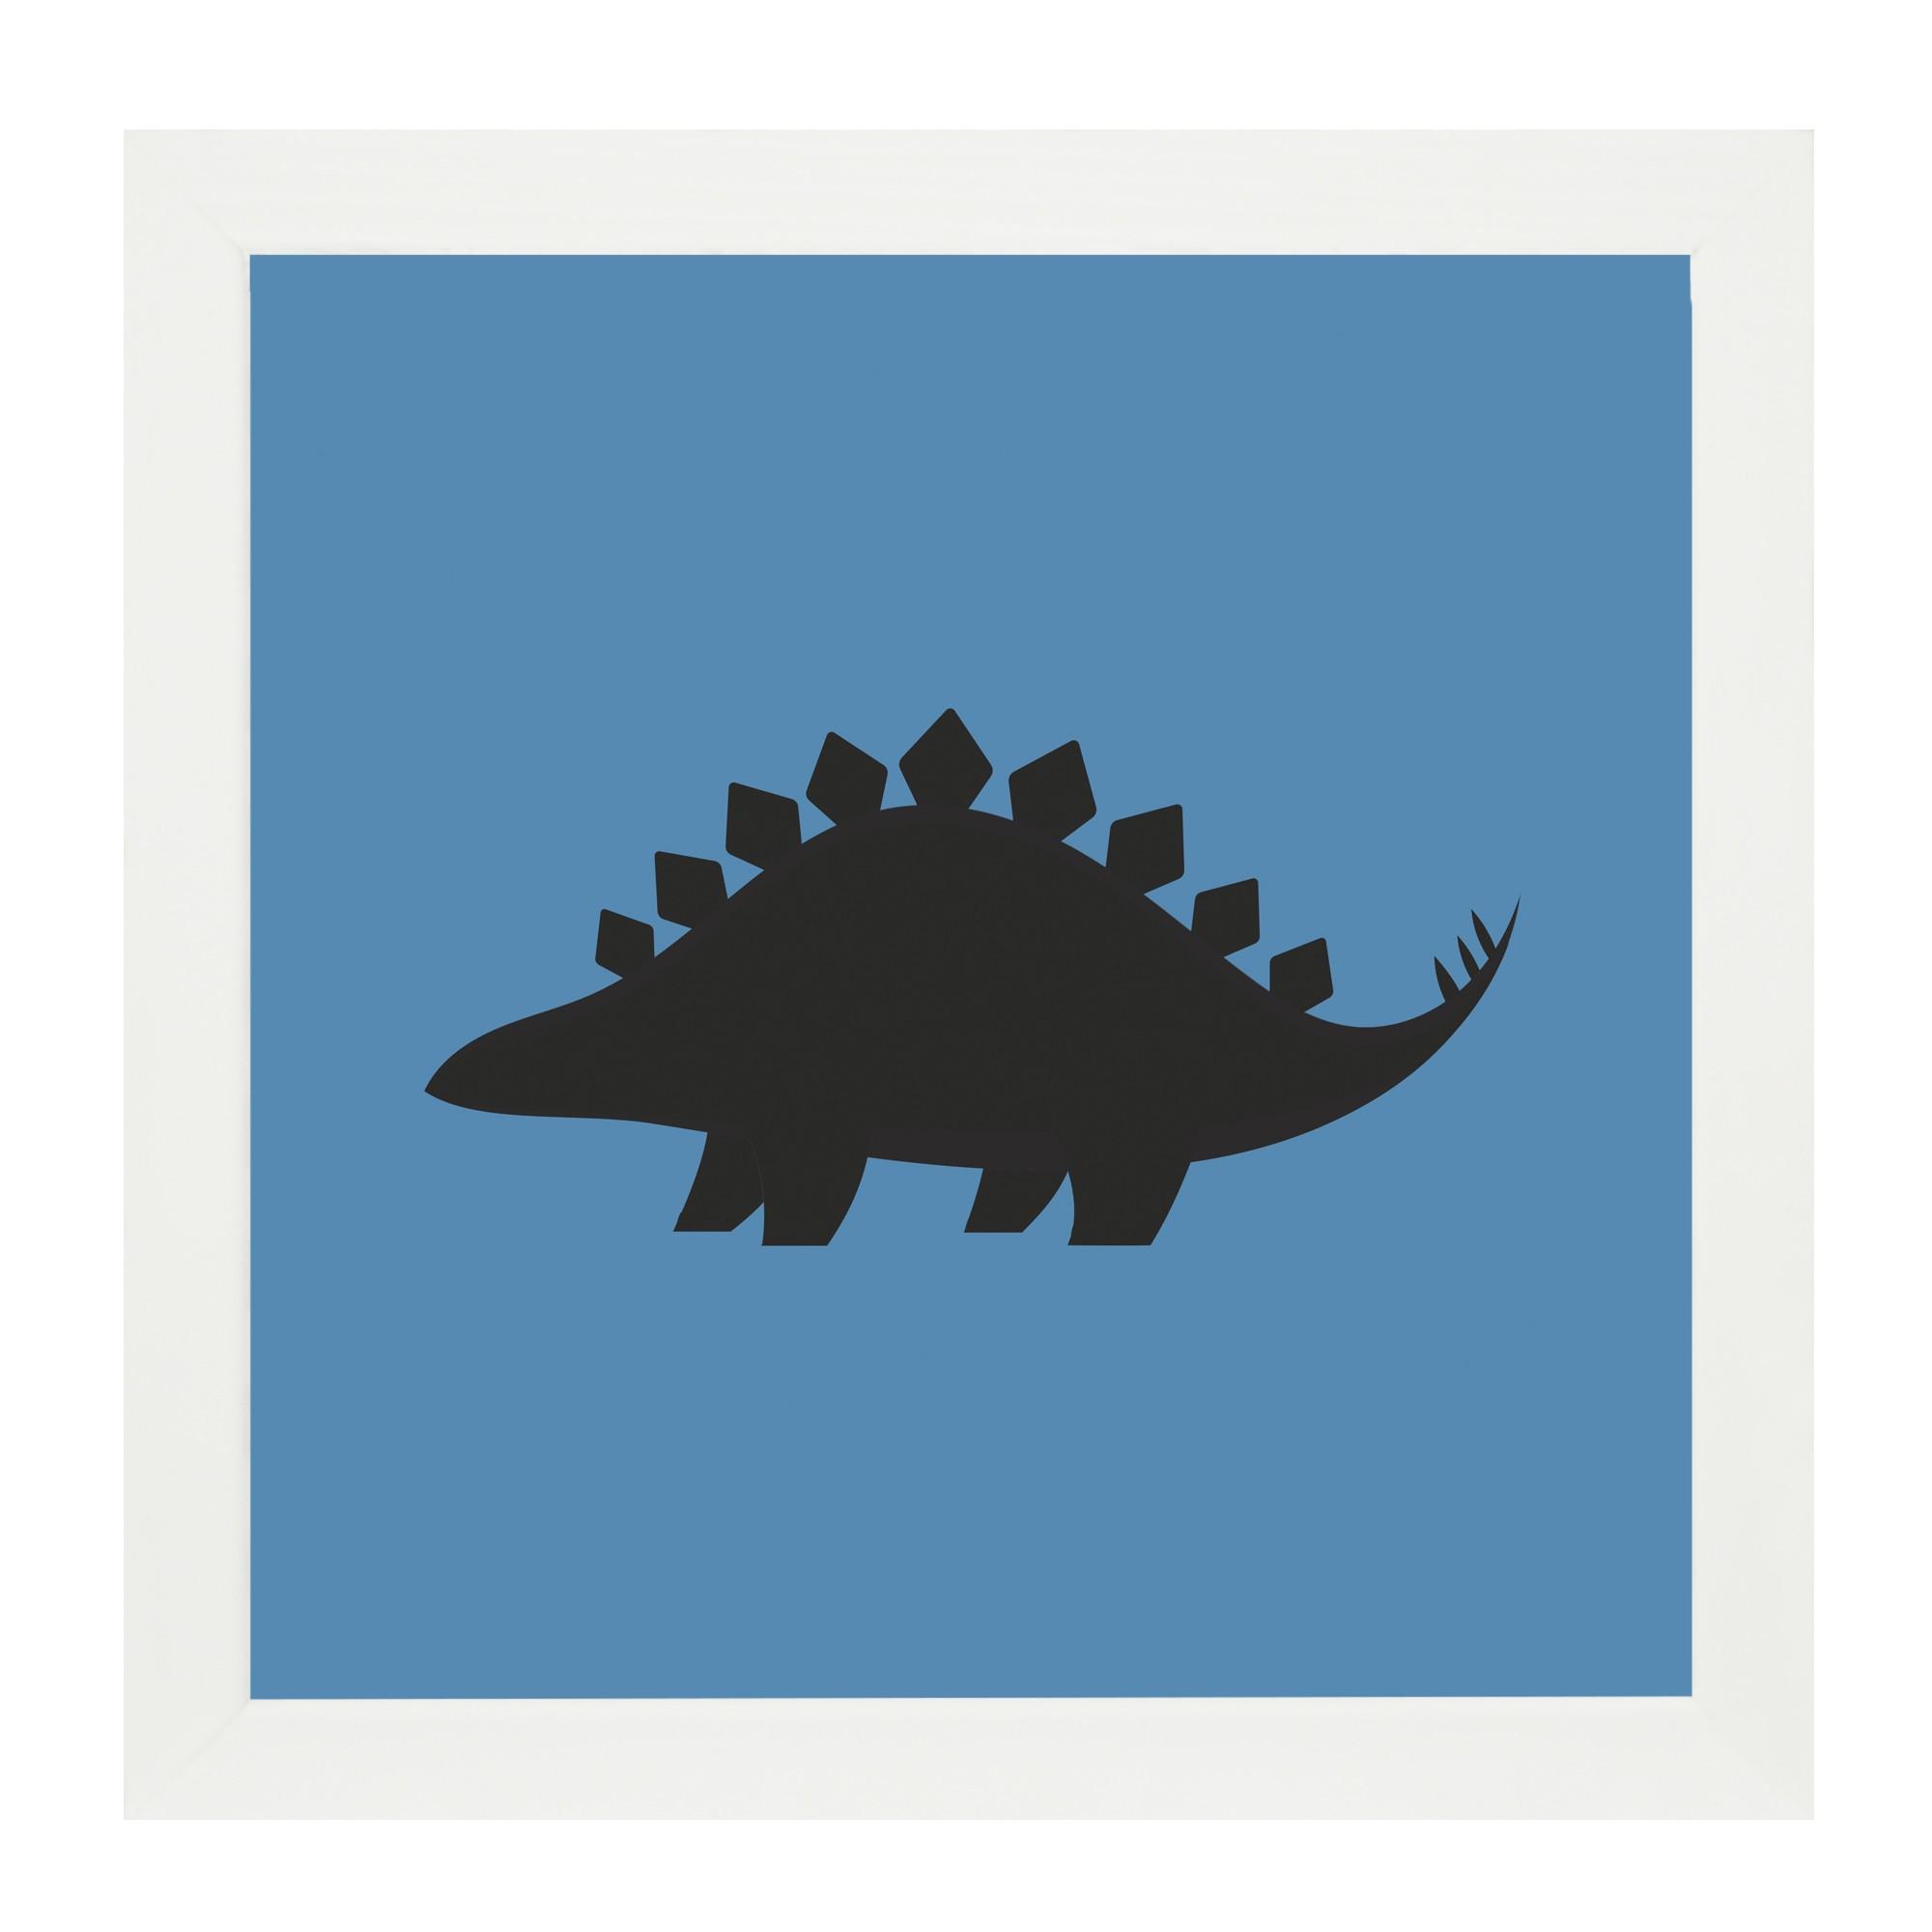 Quadro Decorativo 27x27 cm Dino I - Kapos